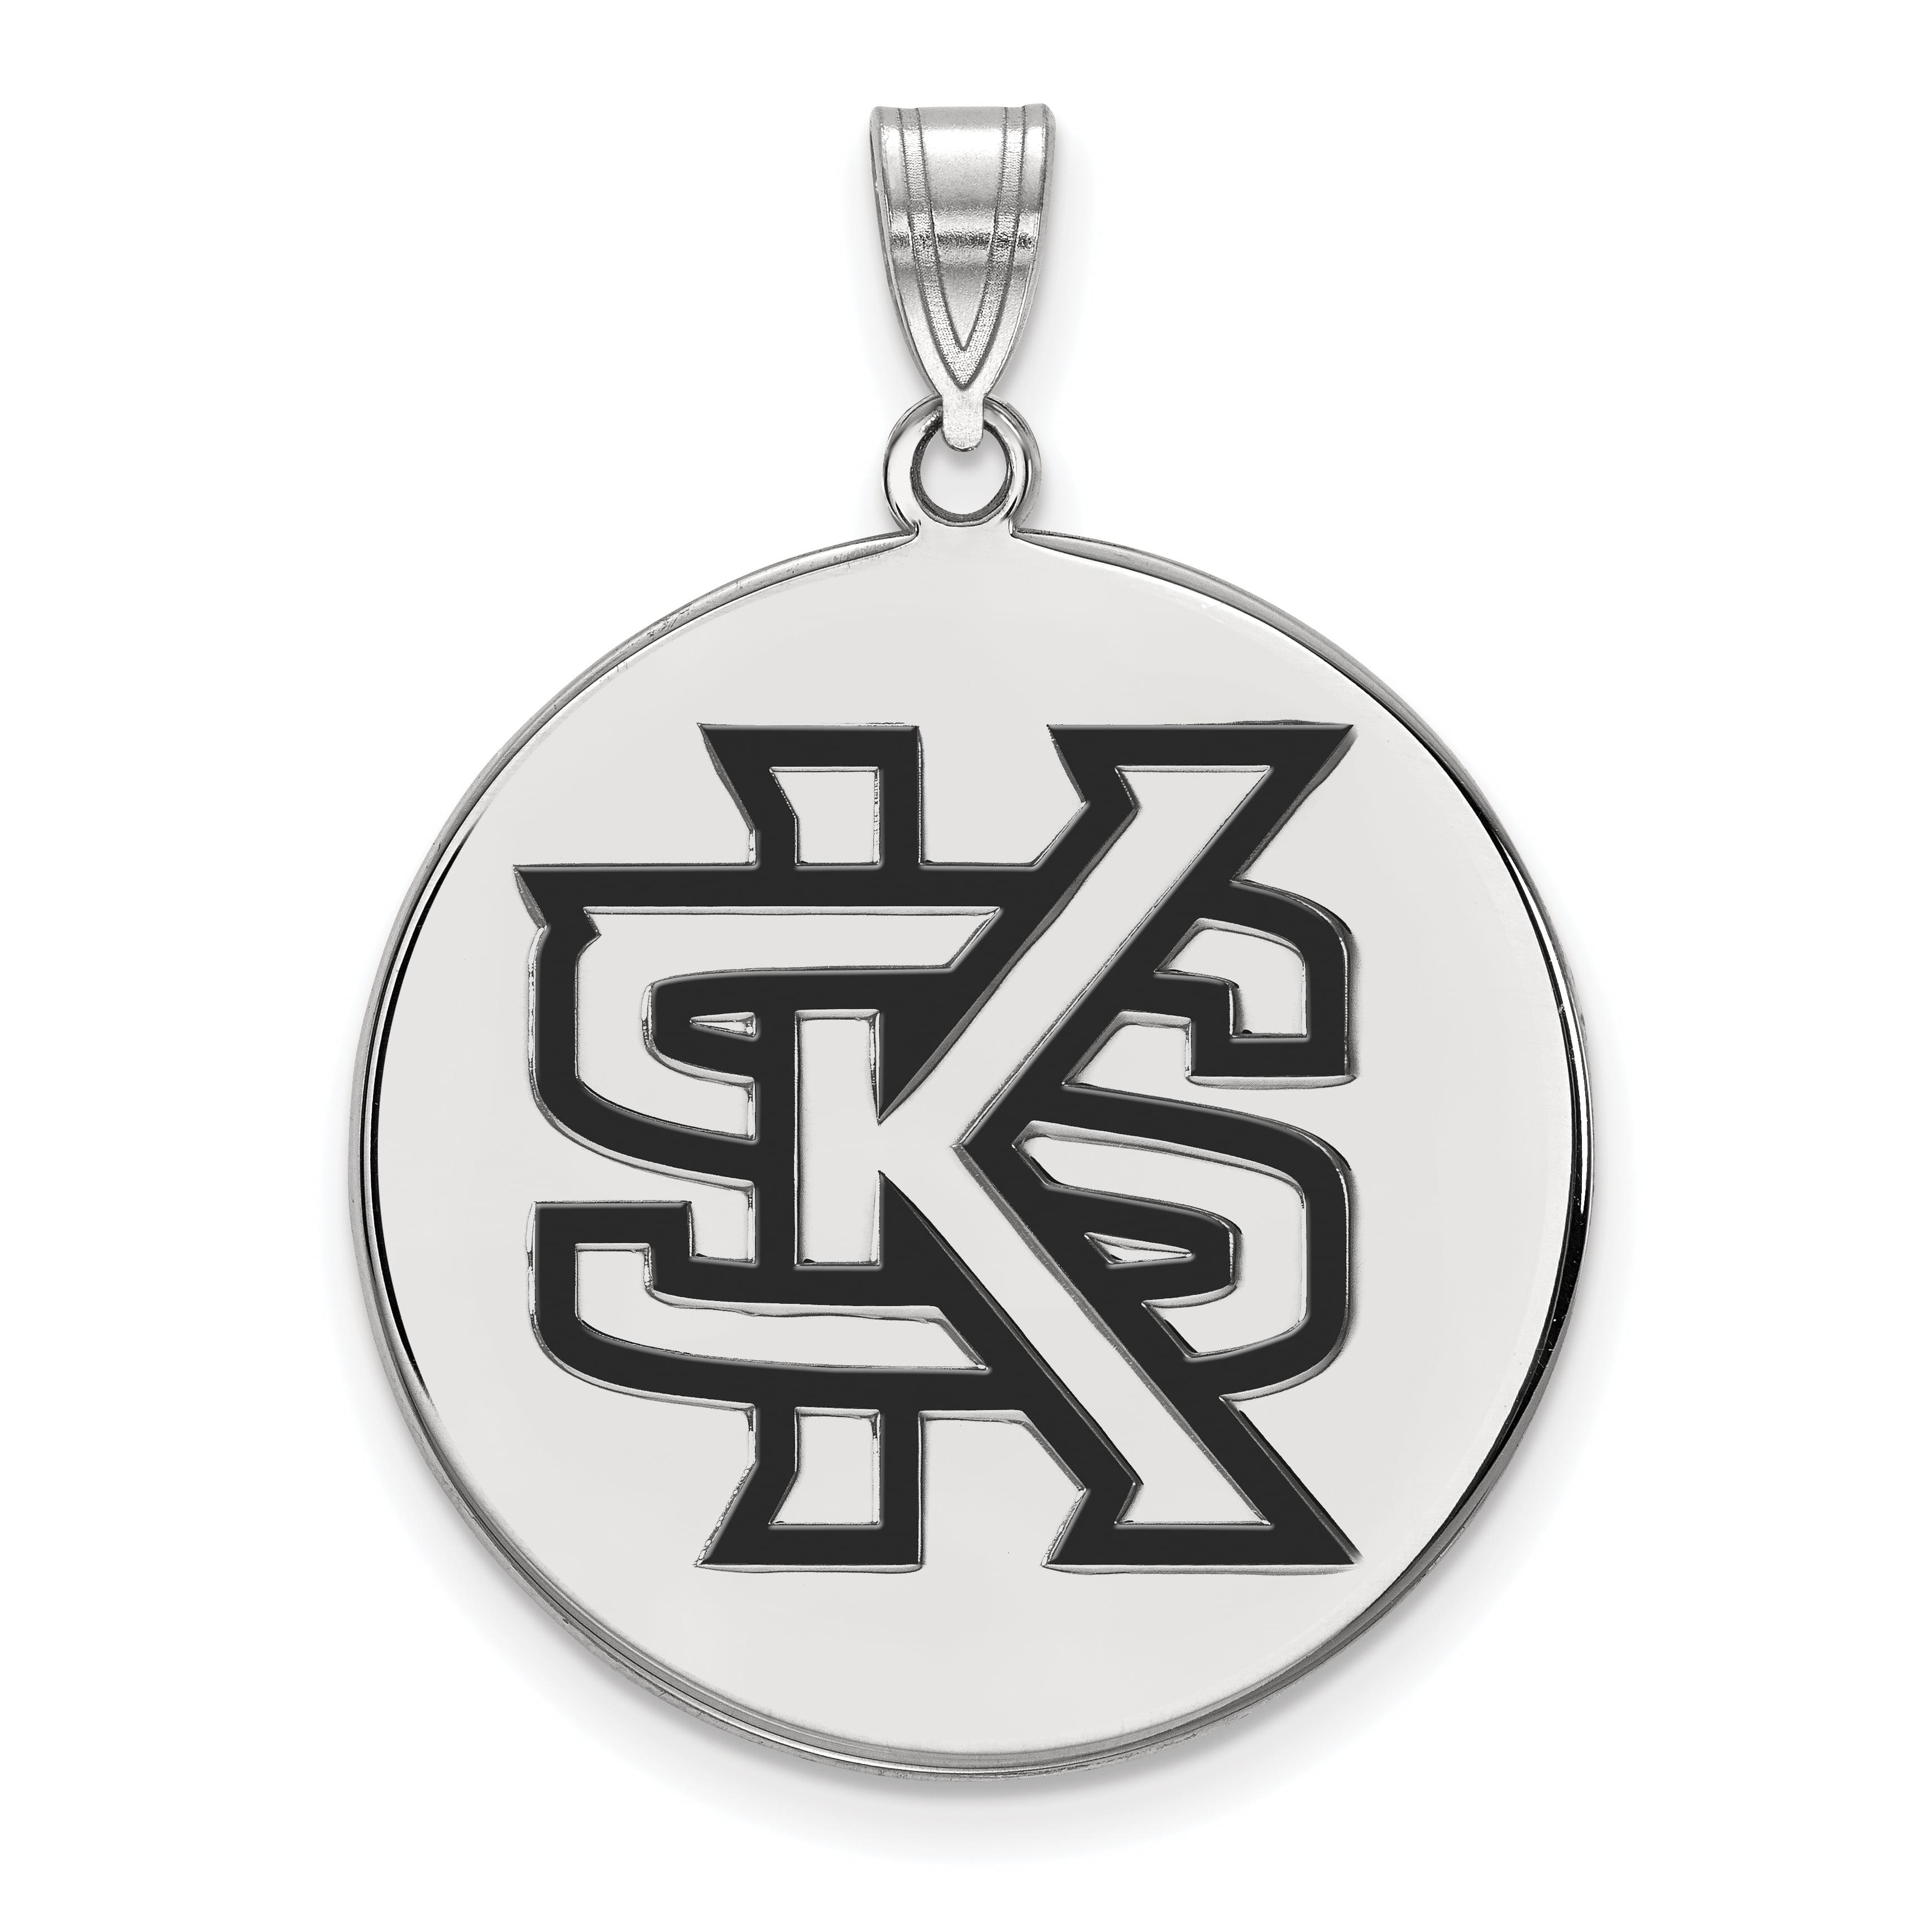 White Sterling Silver Charm Pendant California NCAA San Francisco State University 32 mm 25